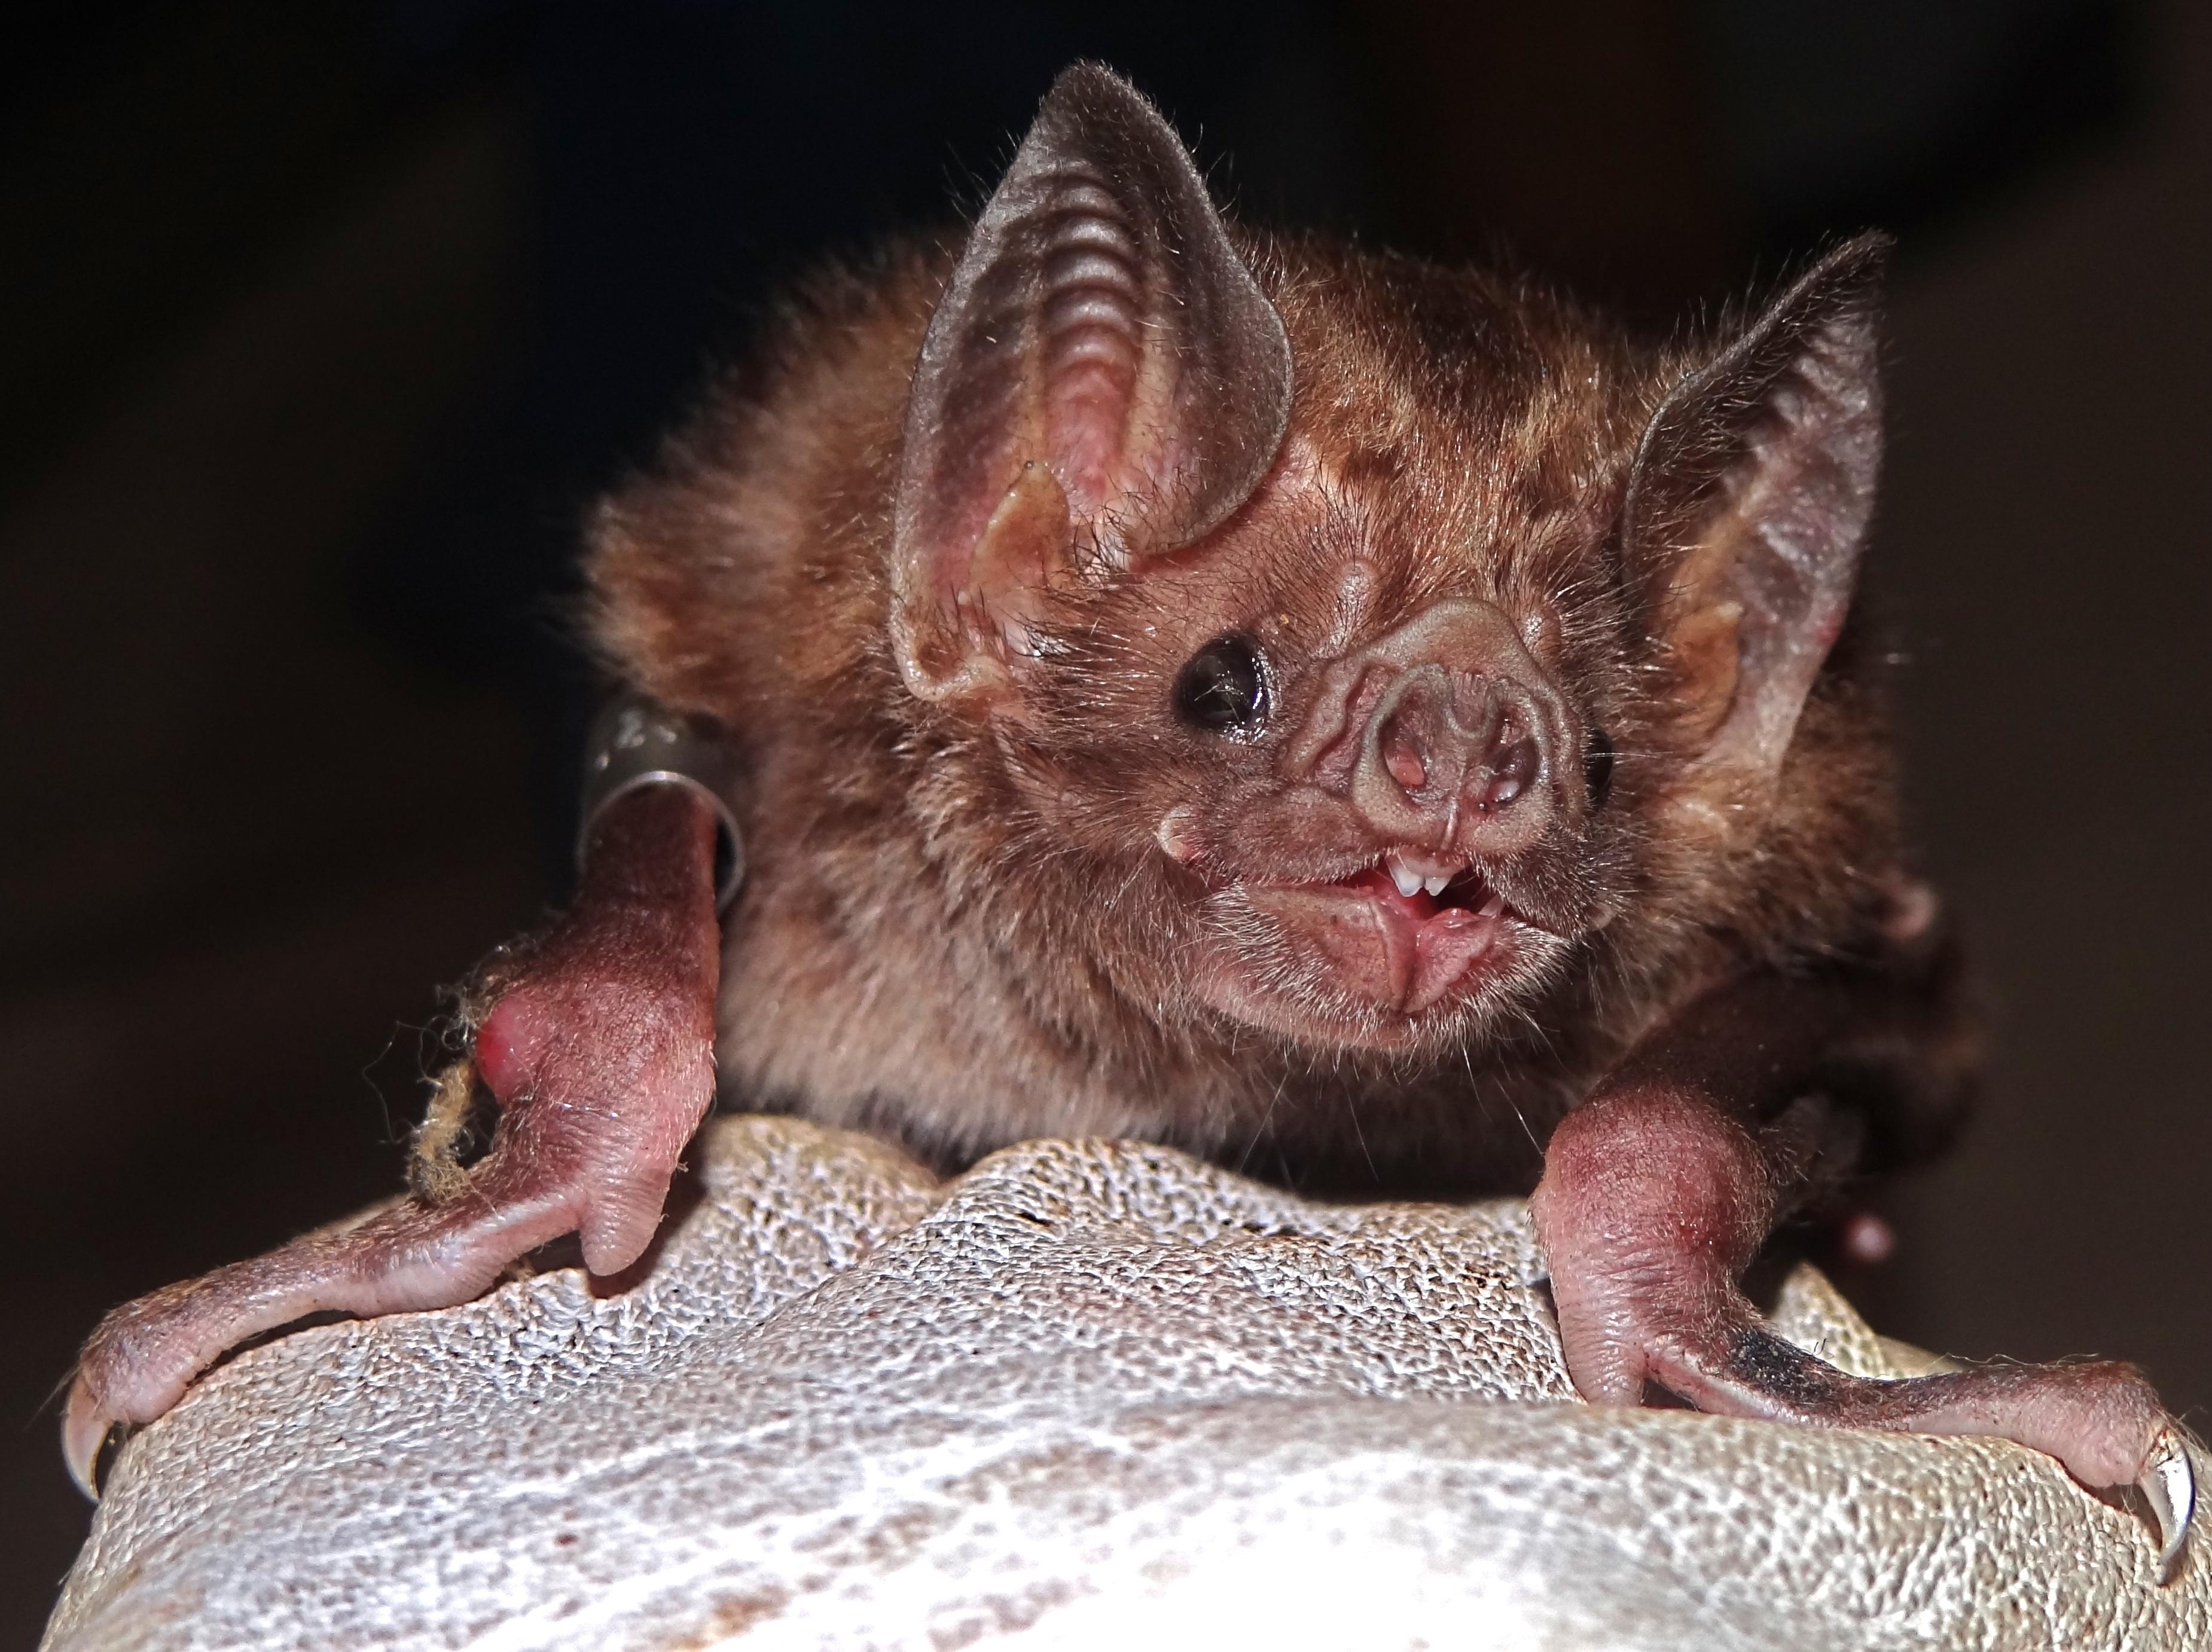 Vampire Bat Hd Background